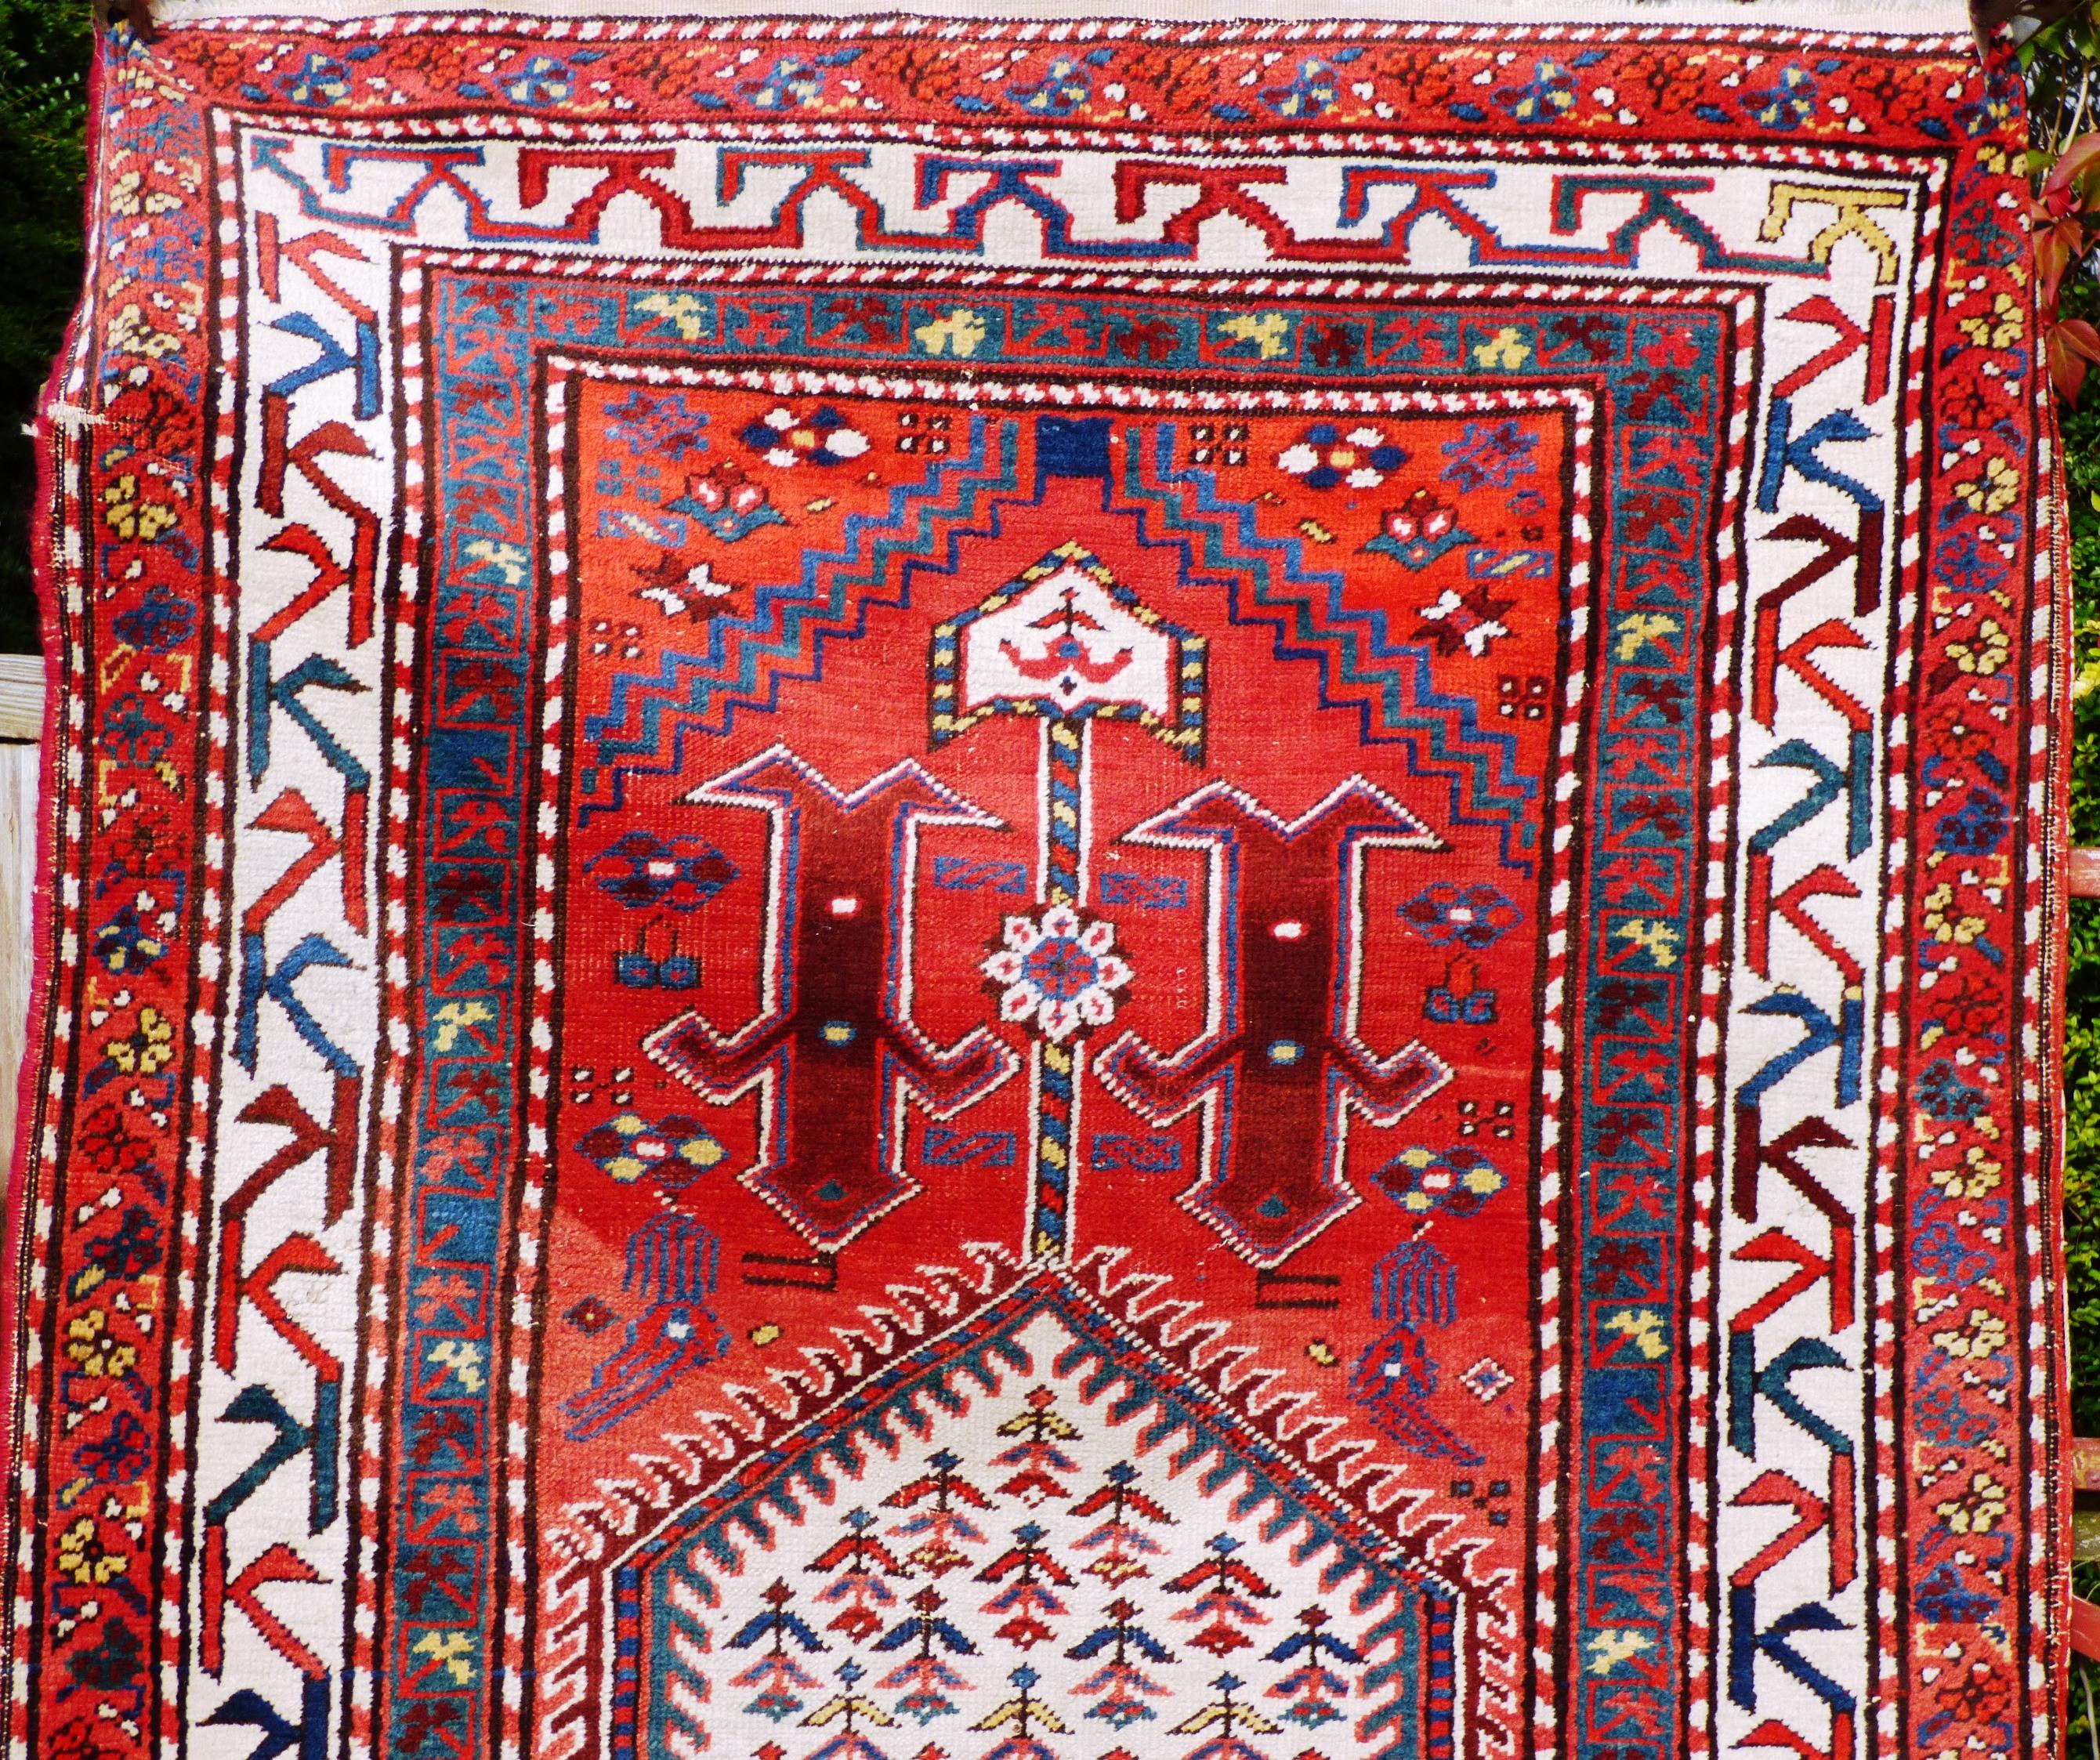 London Antique Rug Textile Art Fair: London Antique Textiles & Tribal Art Fair